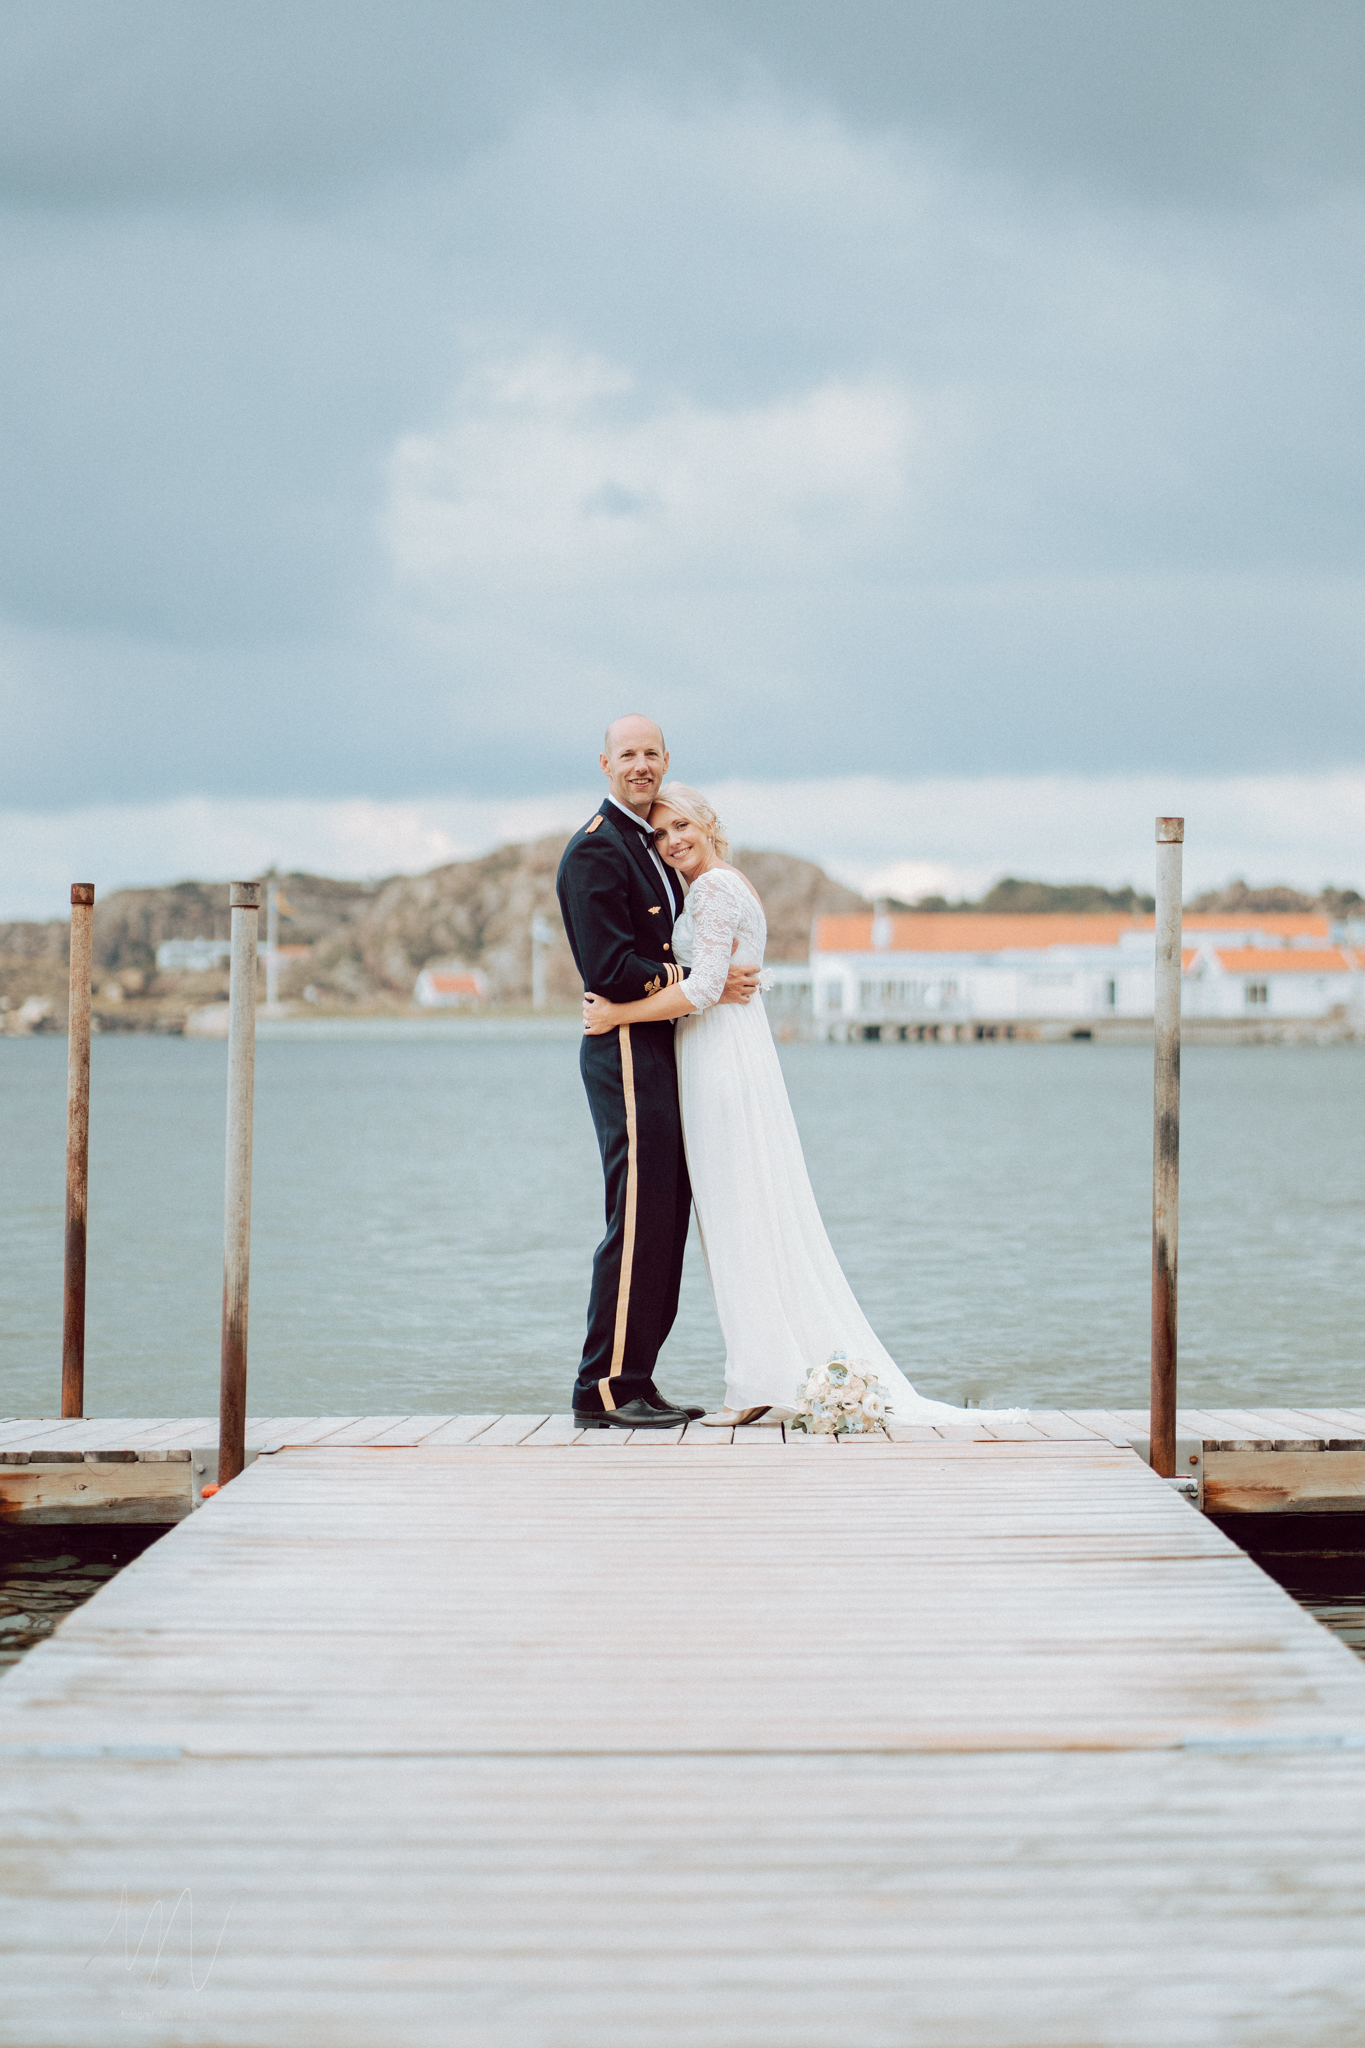 Bröllop-fotografmaxnorin.se-MariaMarcus-377.JPG